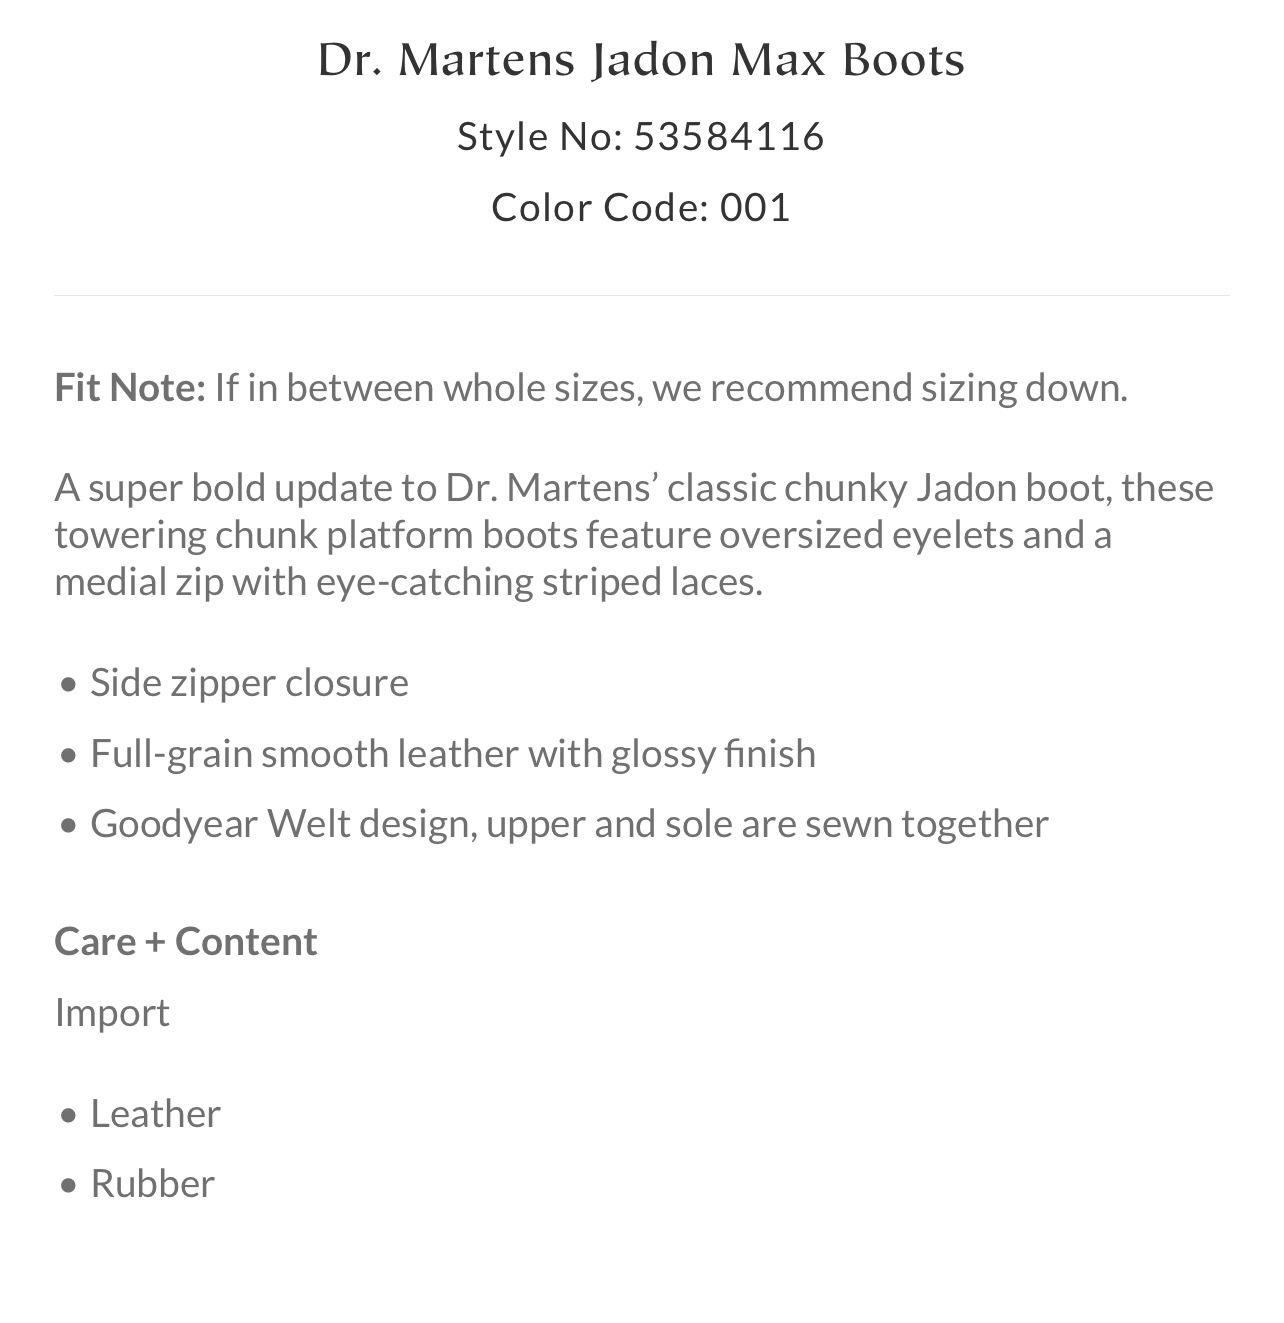 Dr. Martens Jadon Max Boots, Size 8